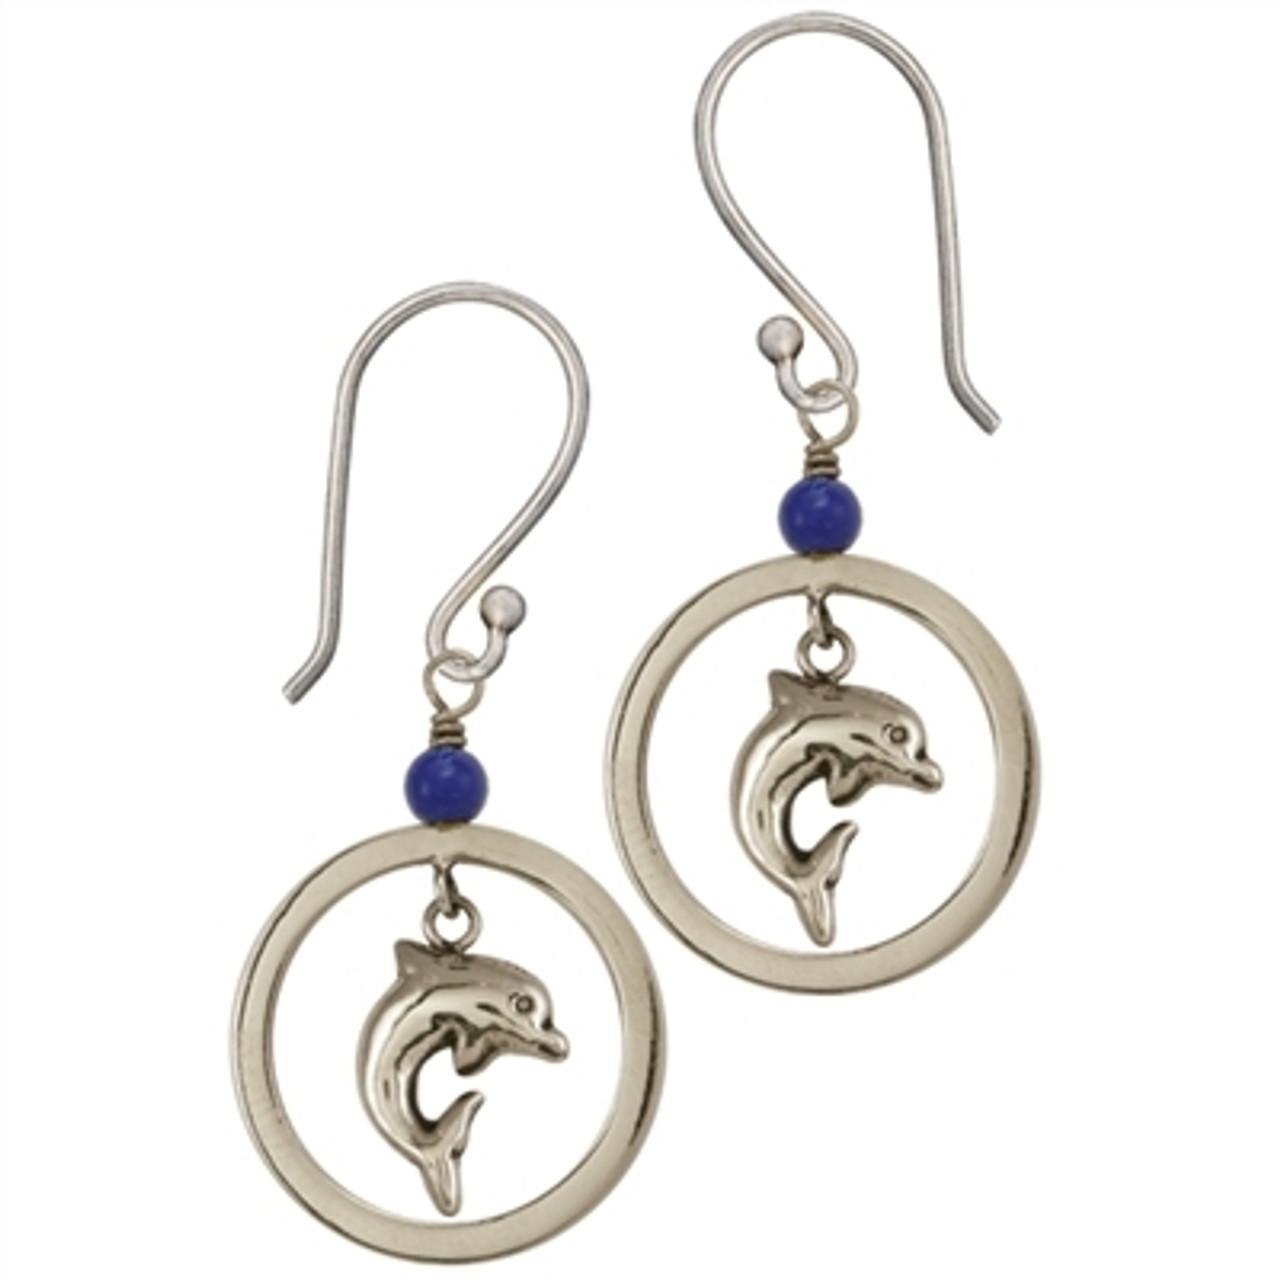 Dolphin Earrings for Tweens